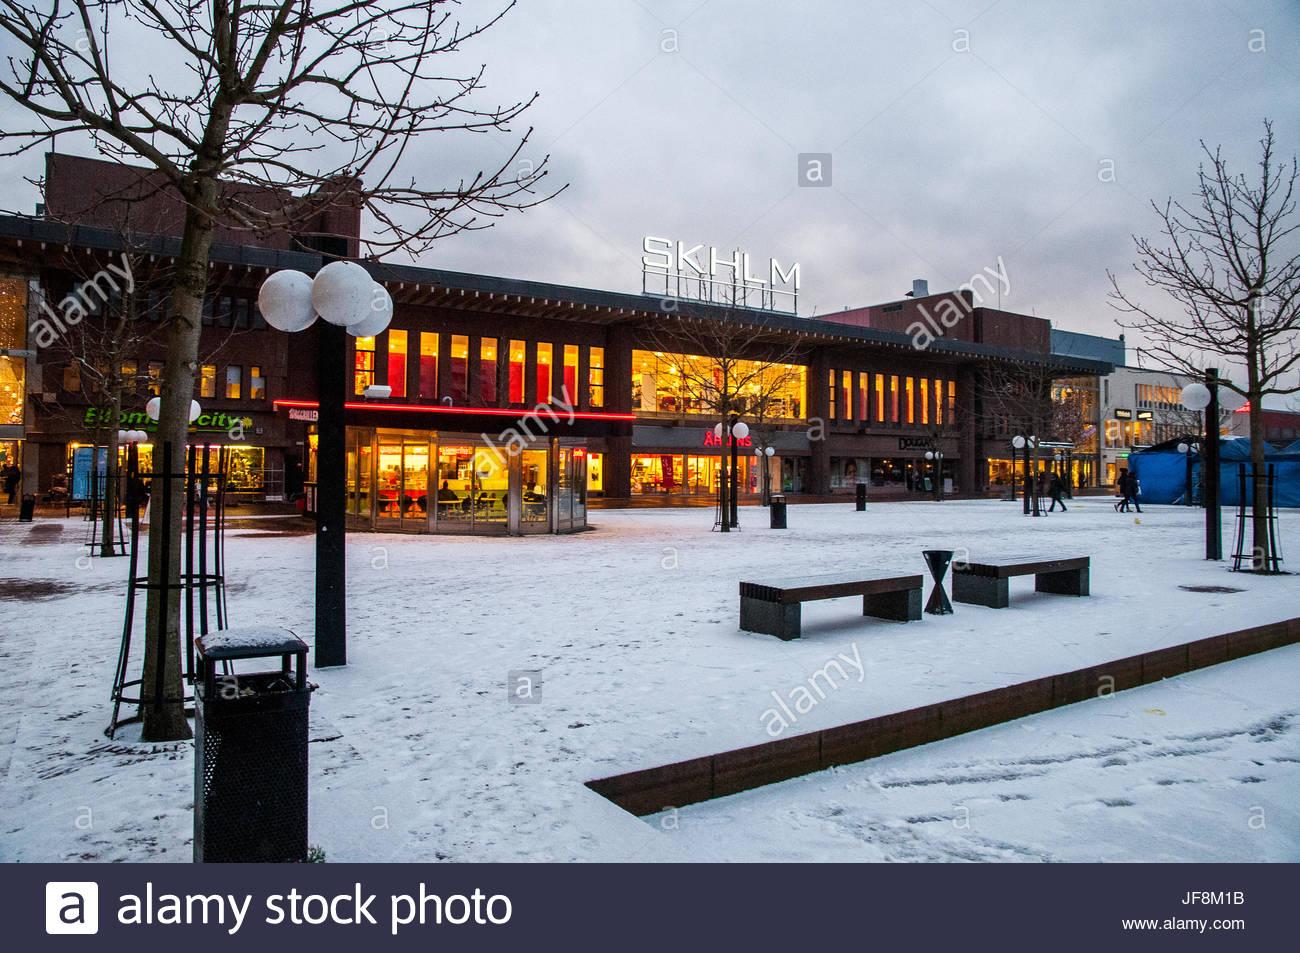 The Skarholmen shopping center in Stockholm. - Stock Image